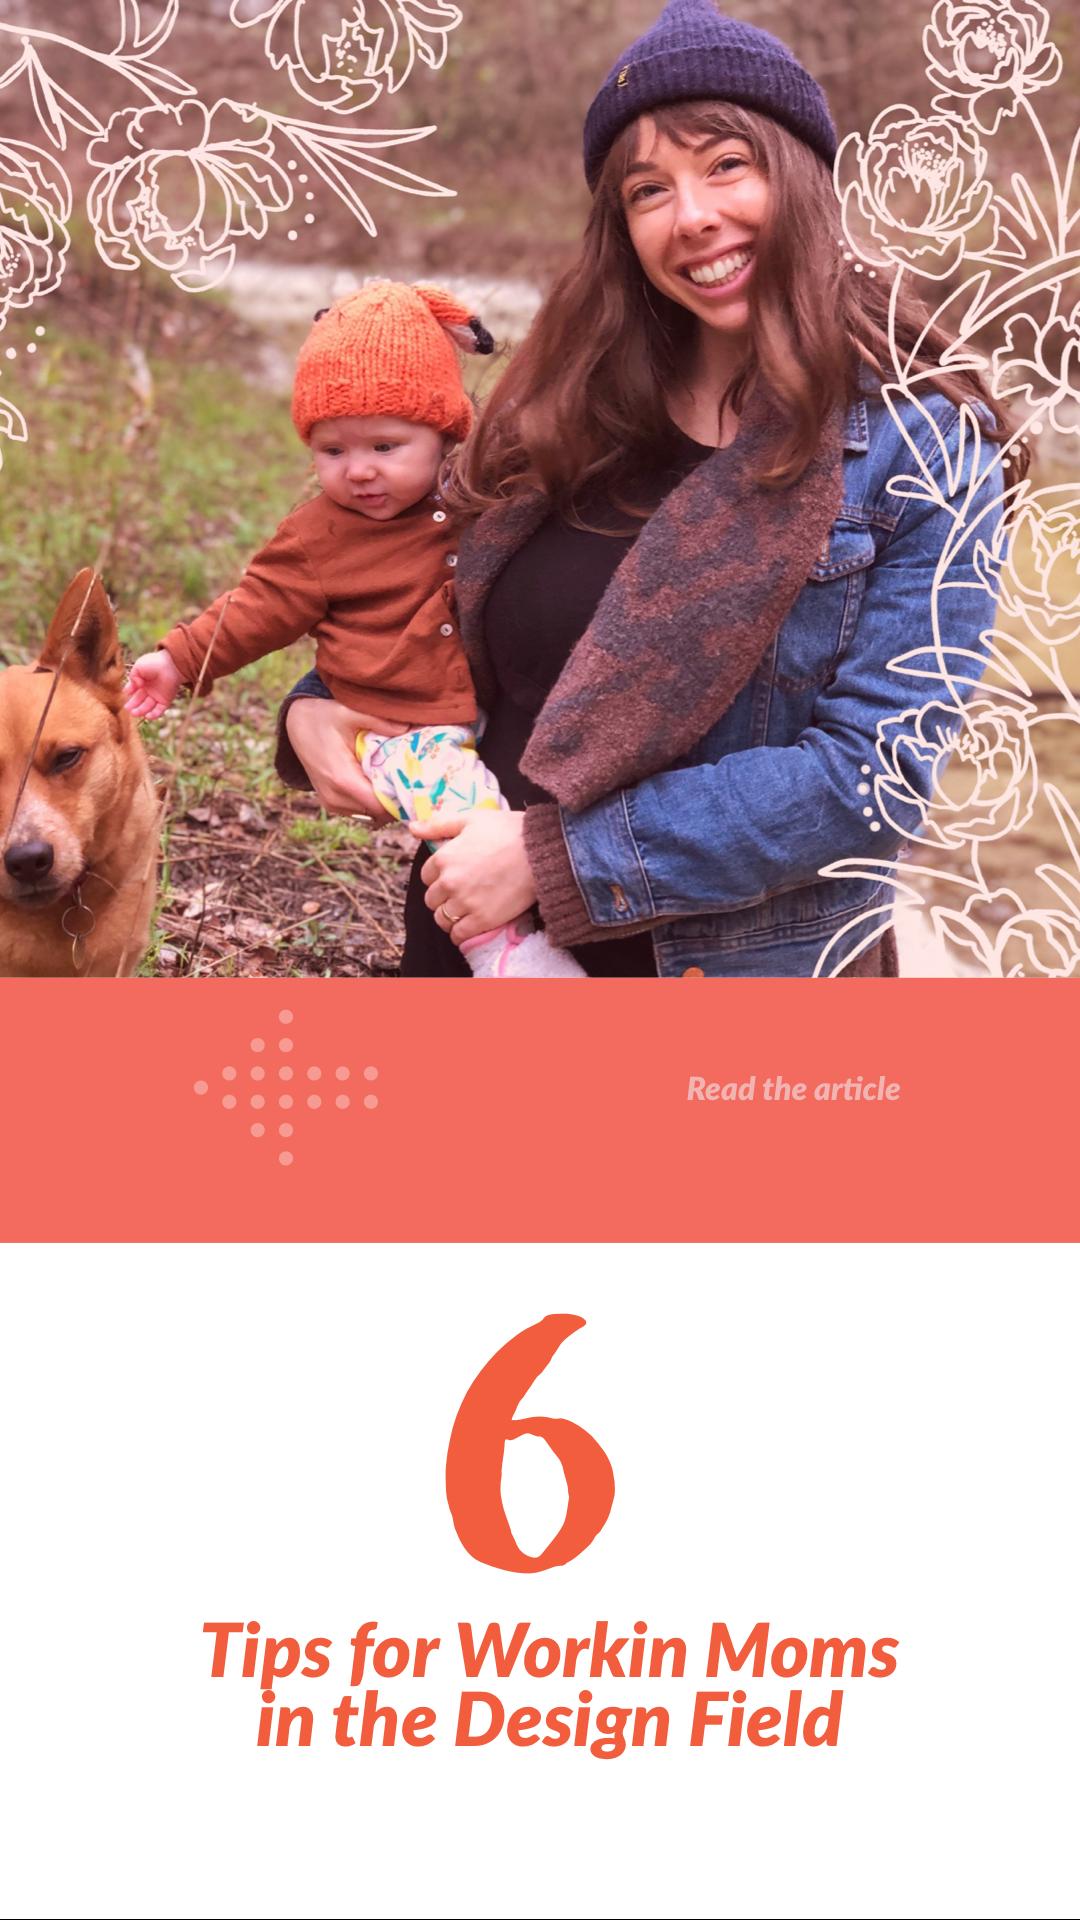 6tipsforworkingmoms.jpg